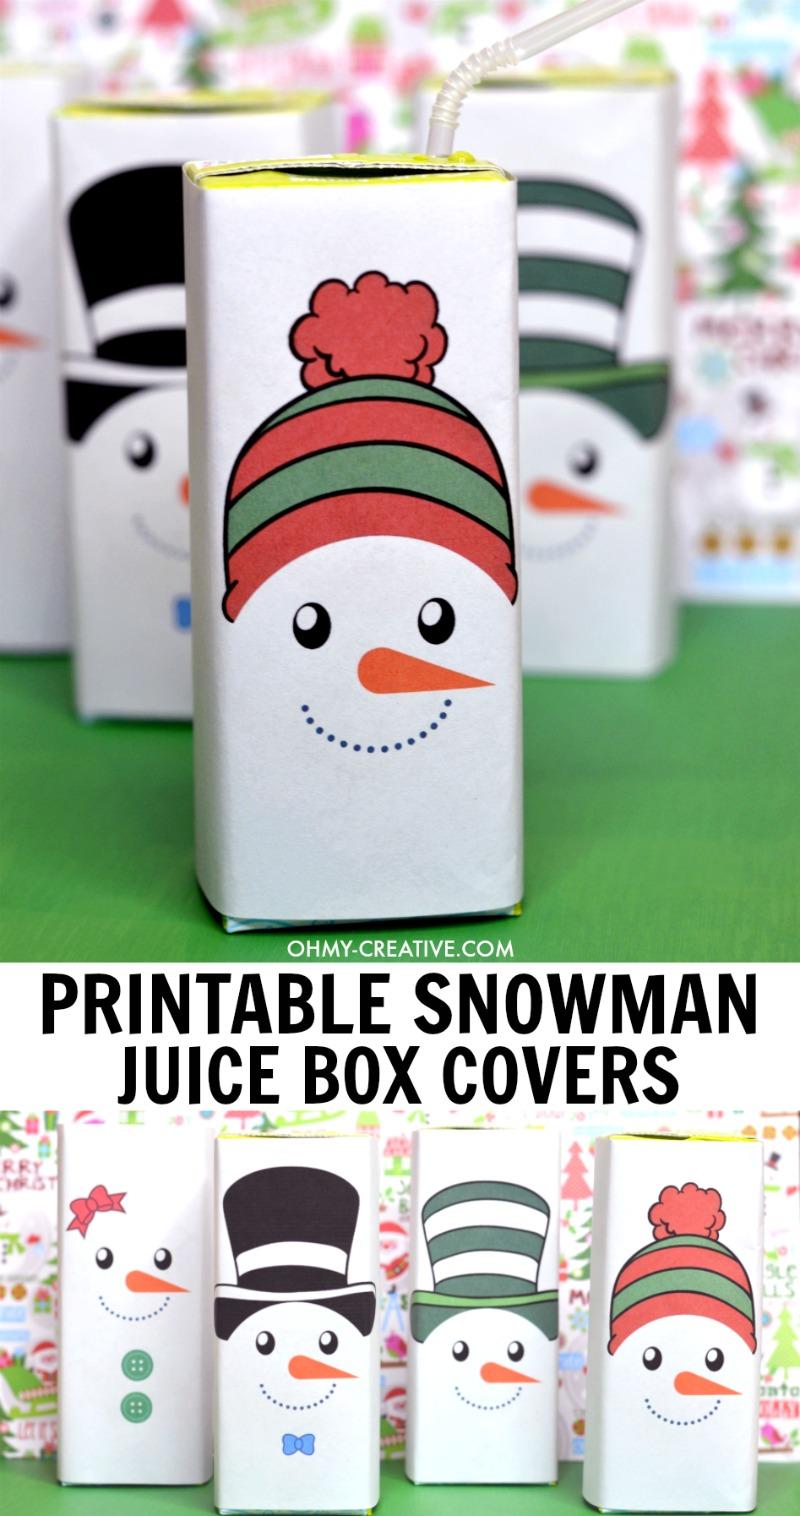 image regarding Snowman Candy Bar Wrapper Free Printable titled Totally free Printable Snowman Juice Box Addresses - Oh My Artistic